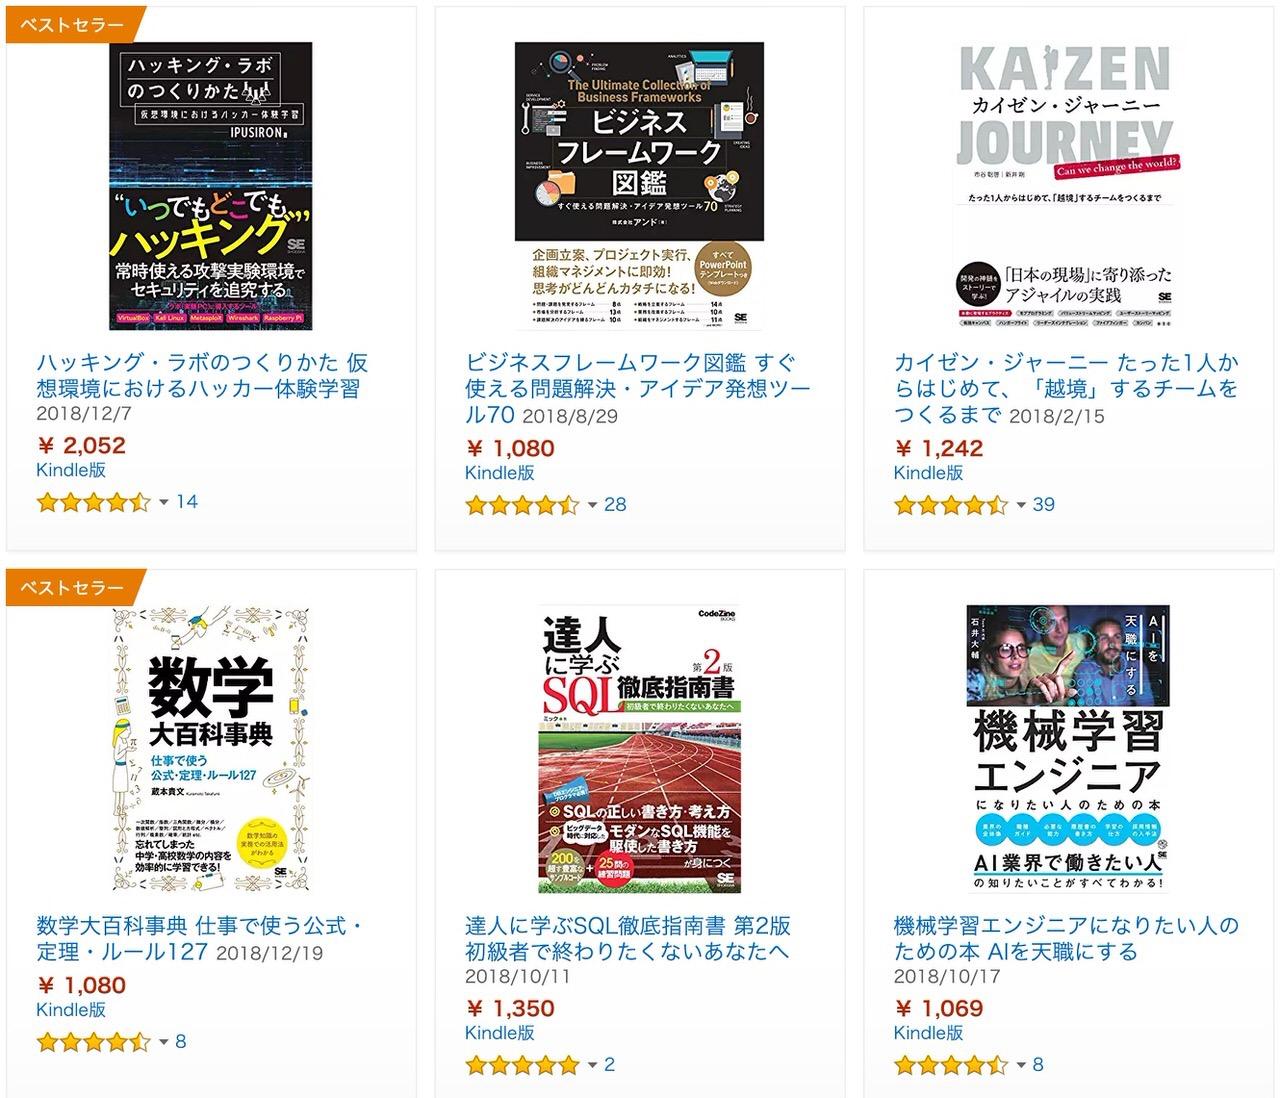 【Kindleセール】1,000点以上が対象!50%OFF「翔泳社祭」(2/15まで)